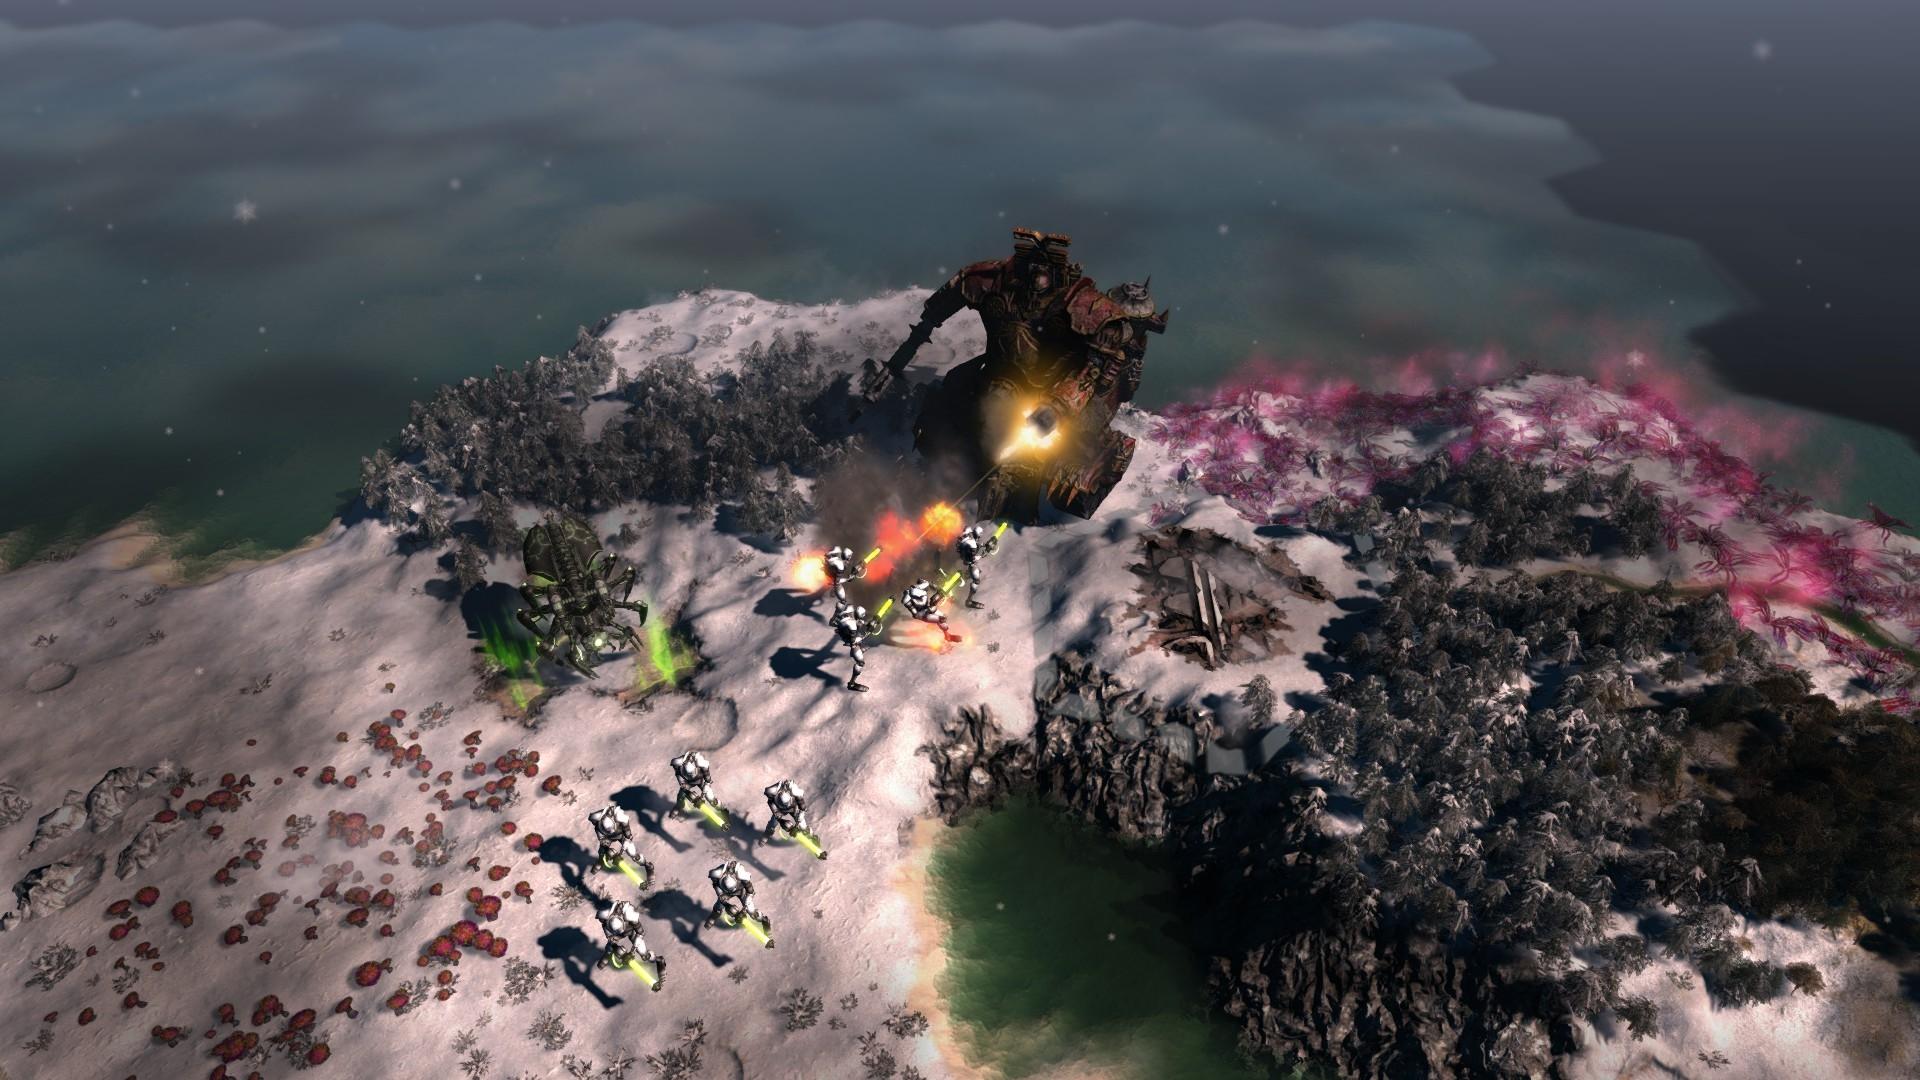 Warhammer 40,000: Gladius – Lord of Skulls | ROW (b42c781b-ac1b-4aac-8340-a849f9513a2b)